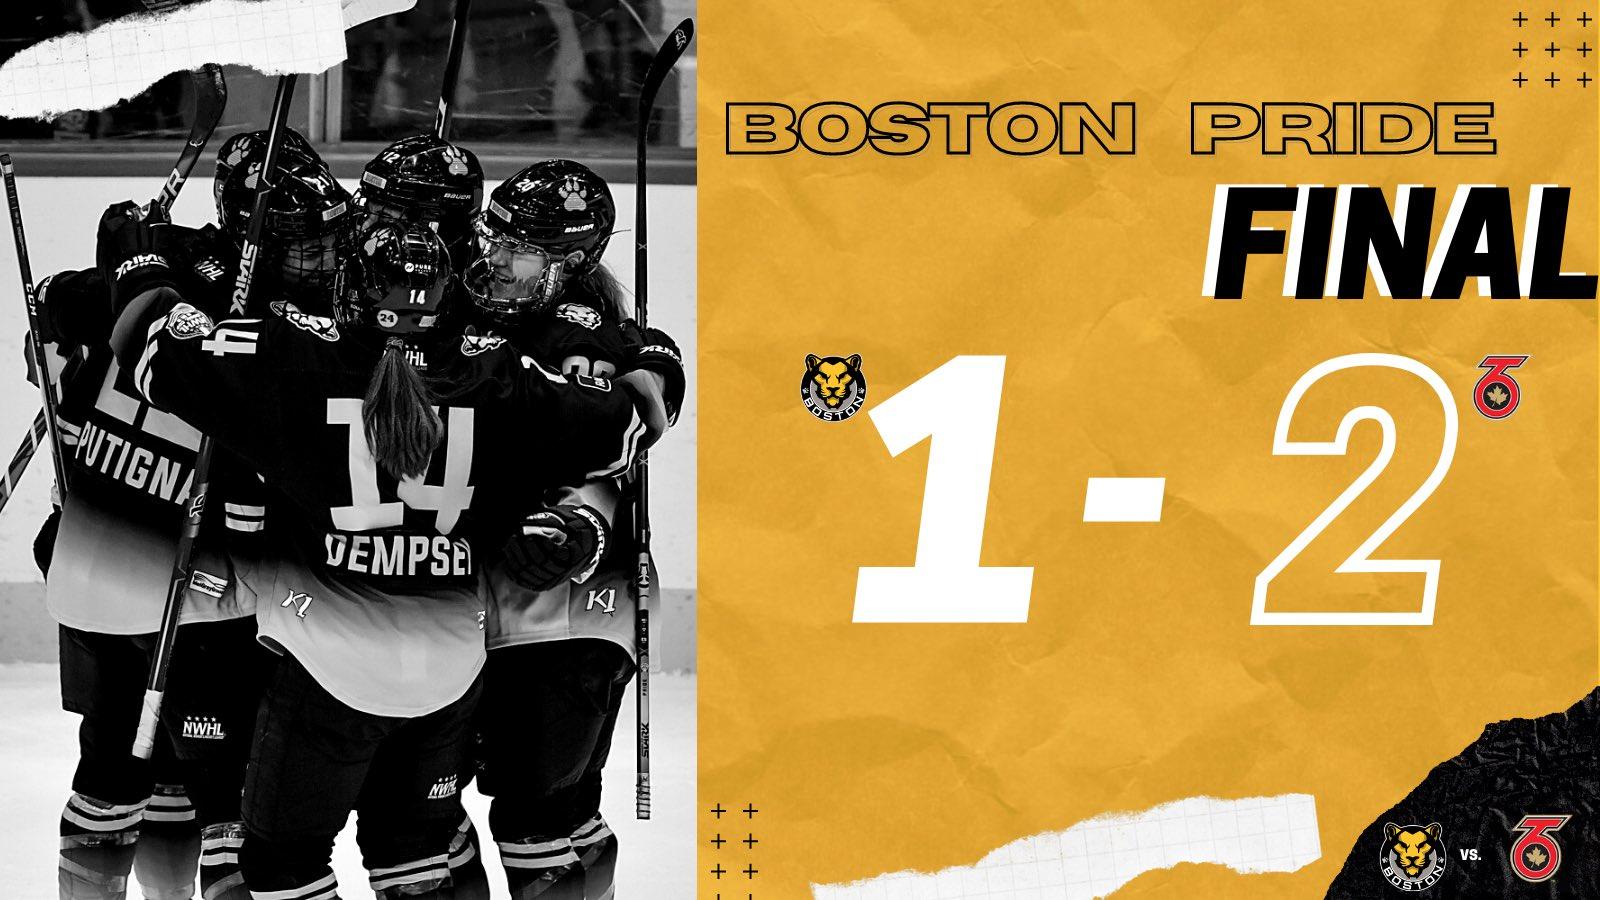 Final score: Toronto Six defeat the Boston Pride 2-1 in regulation.